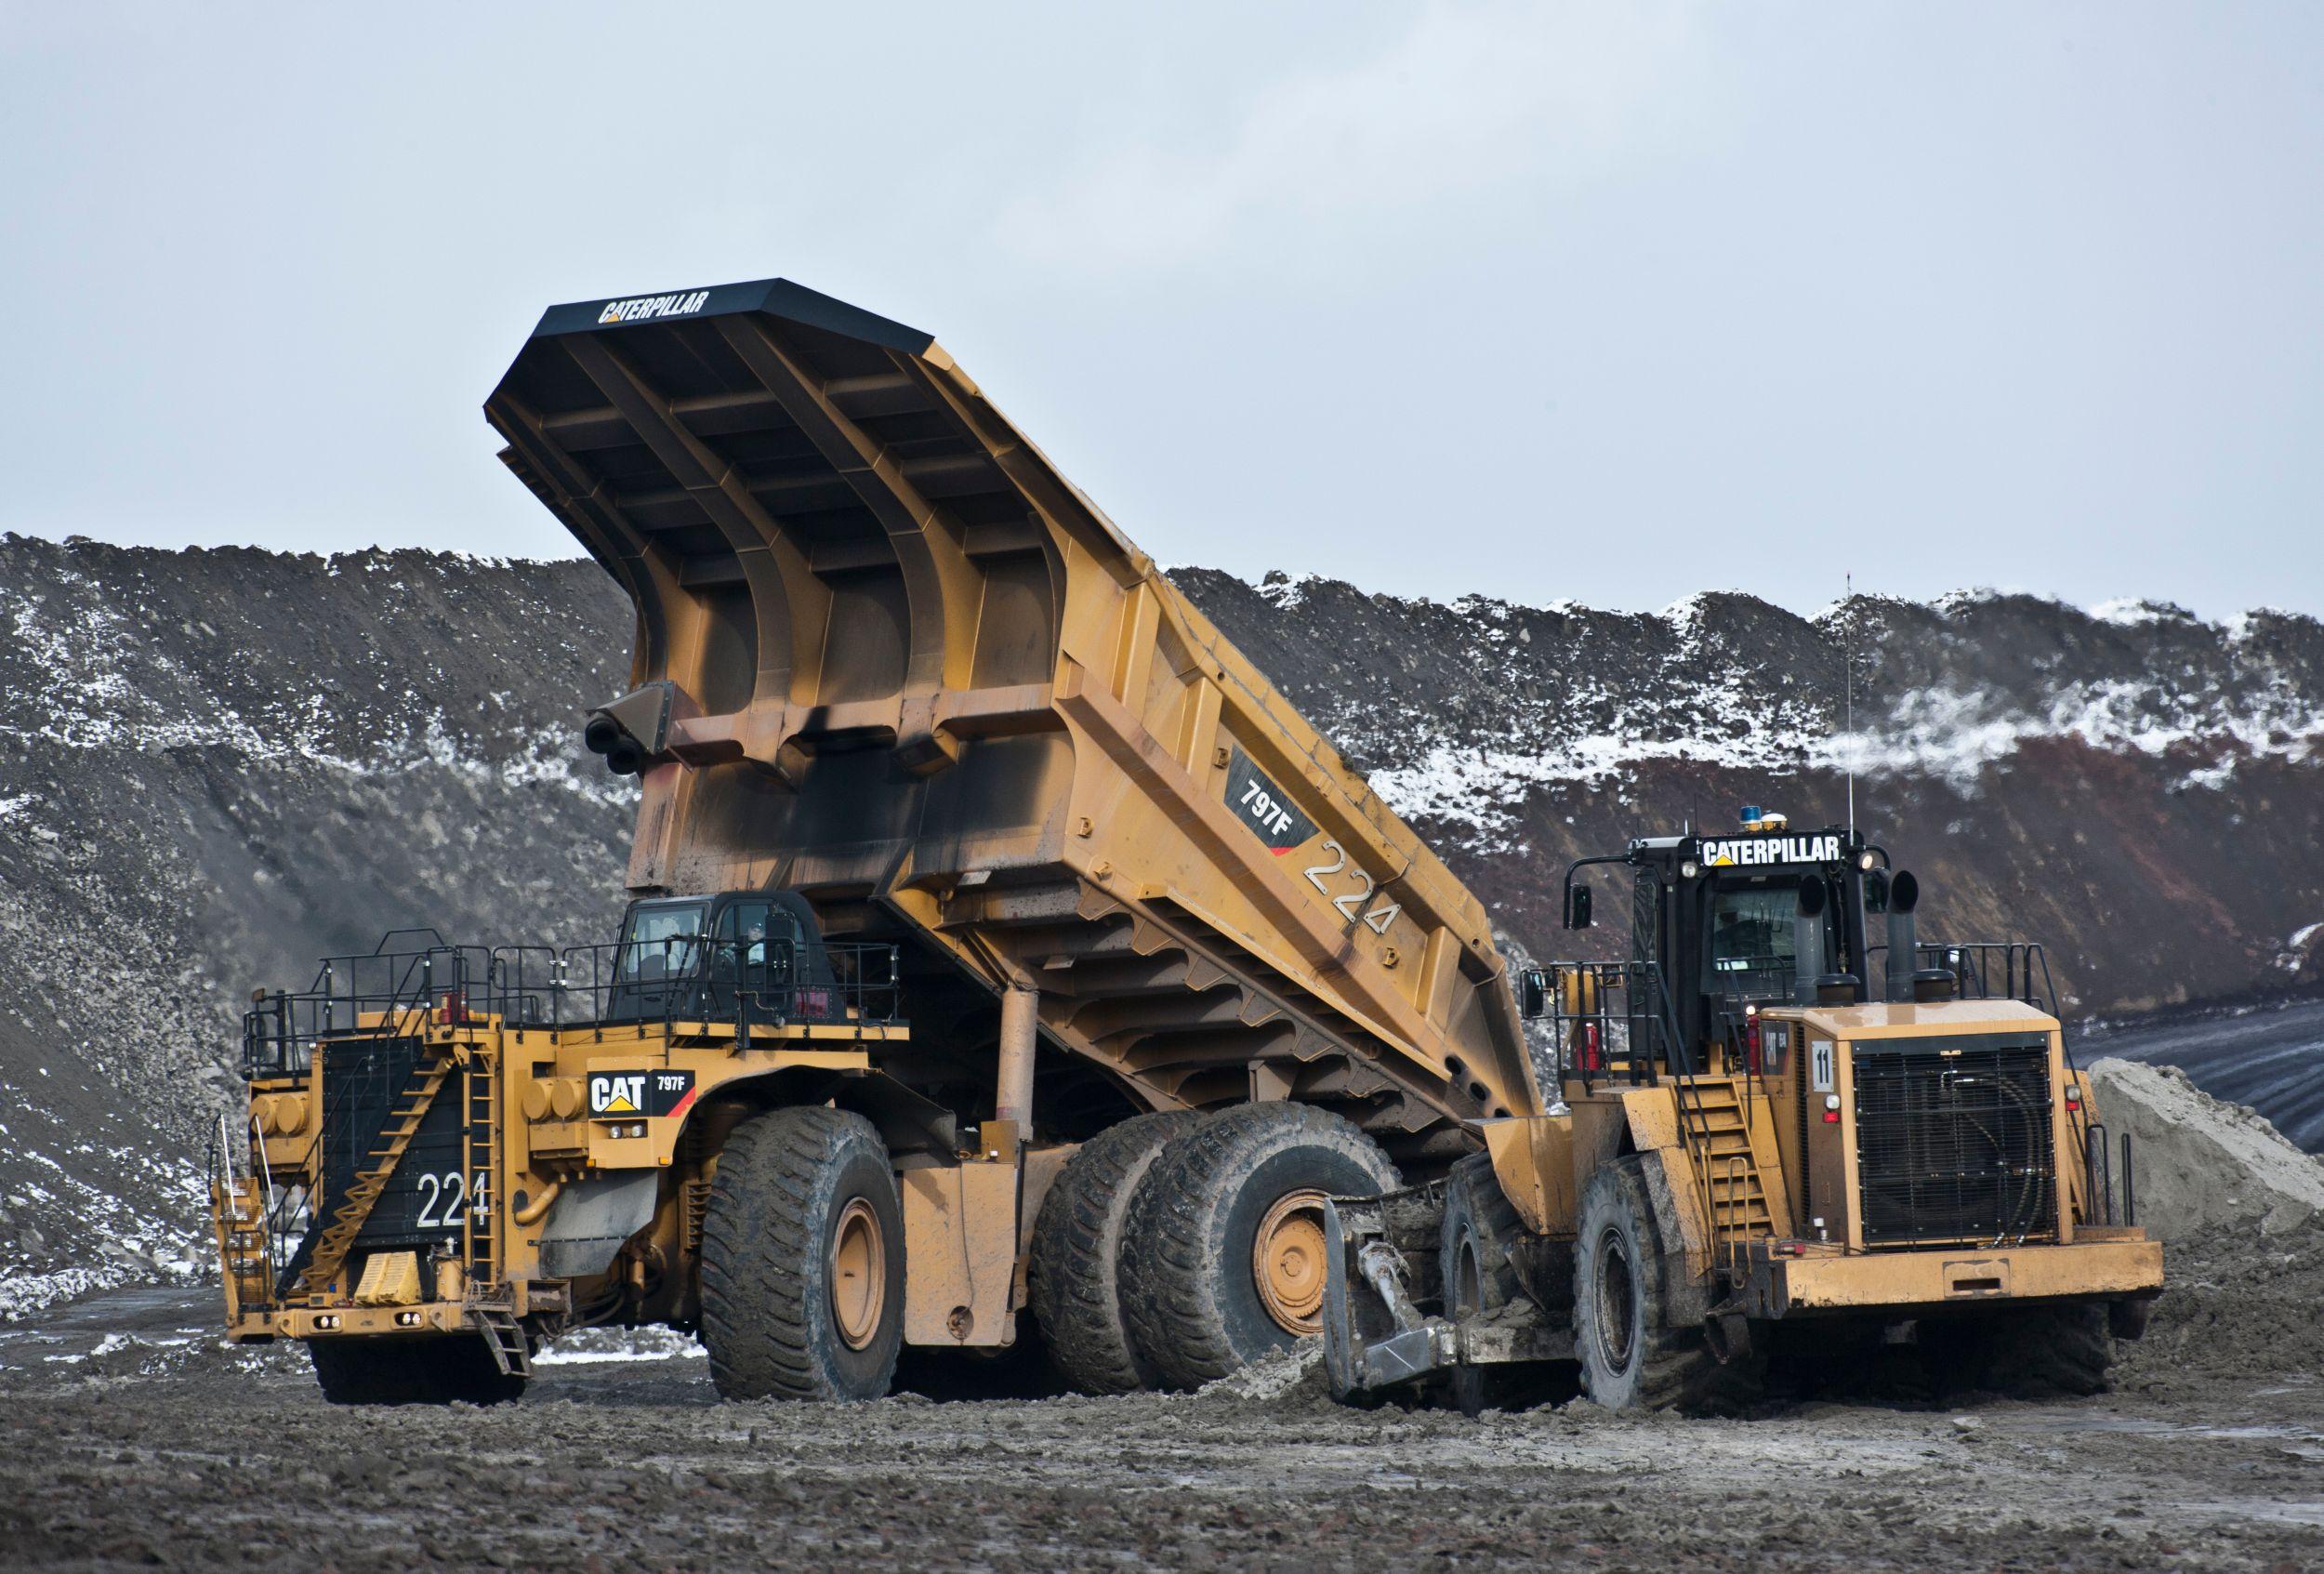 Cat 797f mining highway truck and equipment